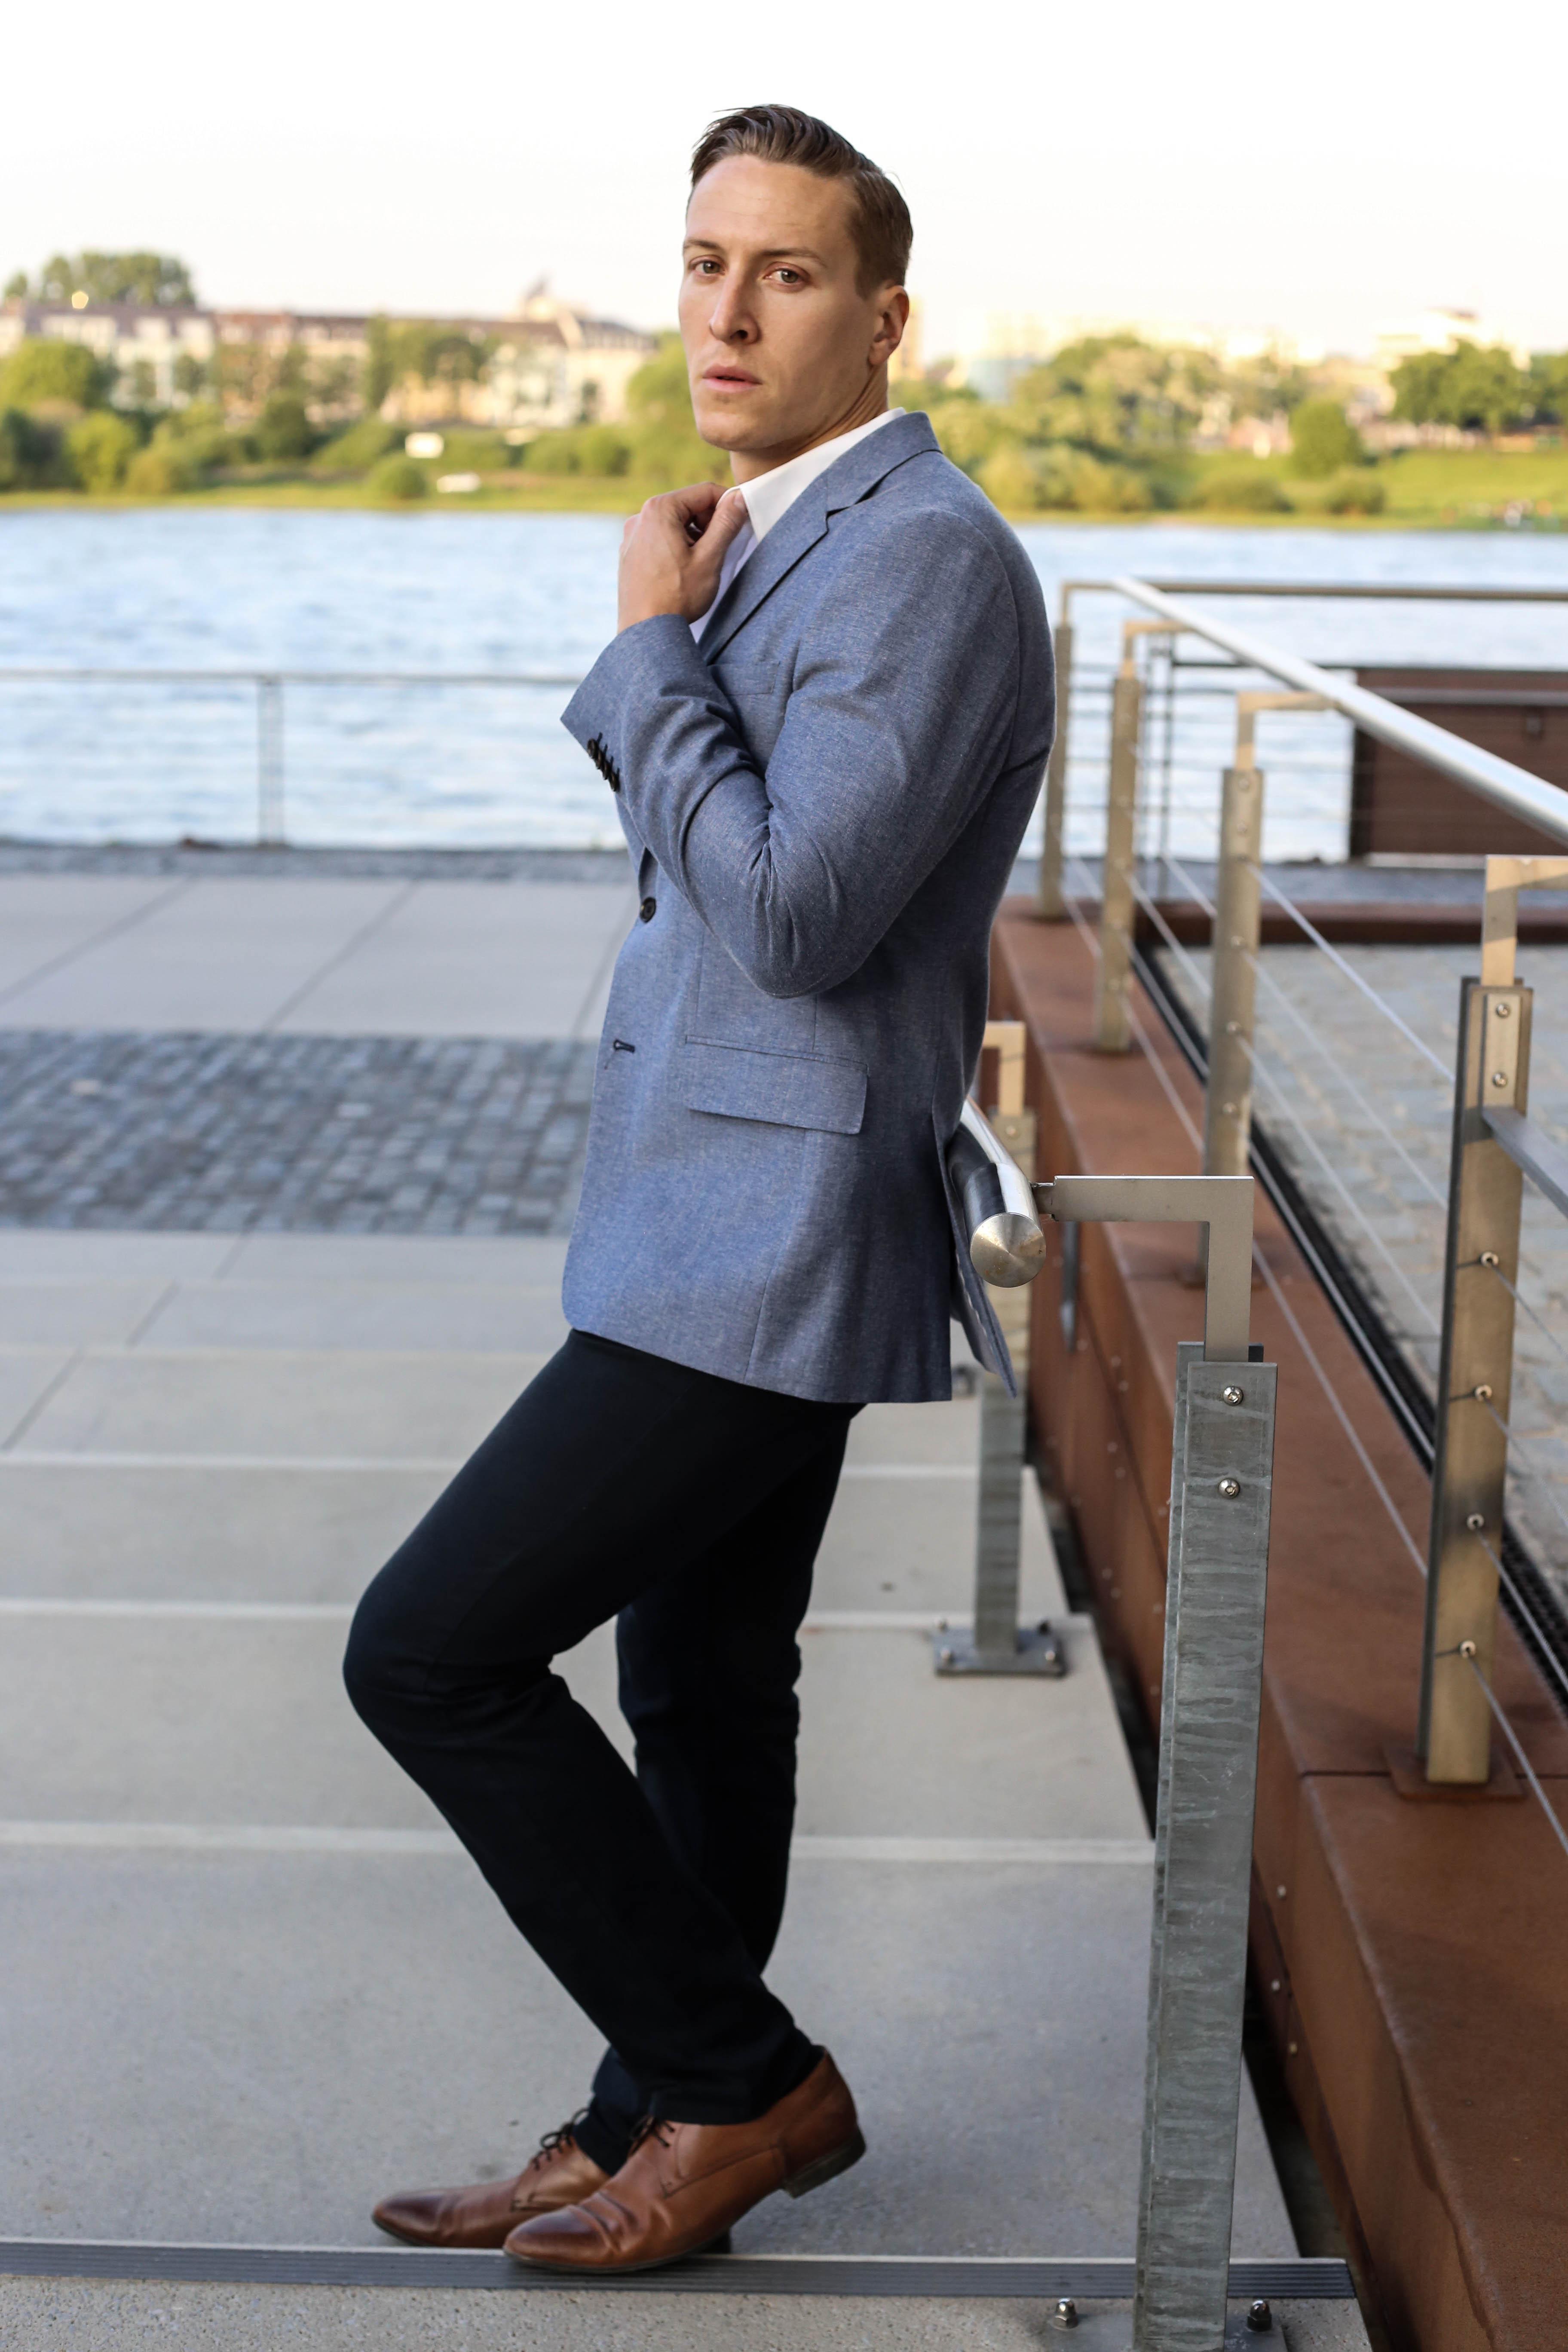 hellblaues-sakko-smart-casual-look-menfashion-fashionblog-berlin_7837